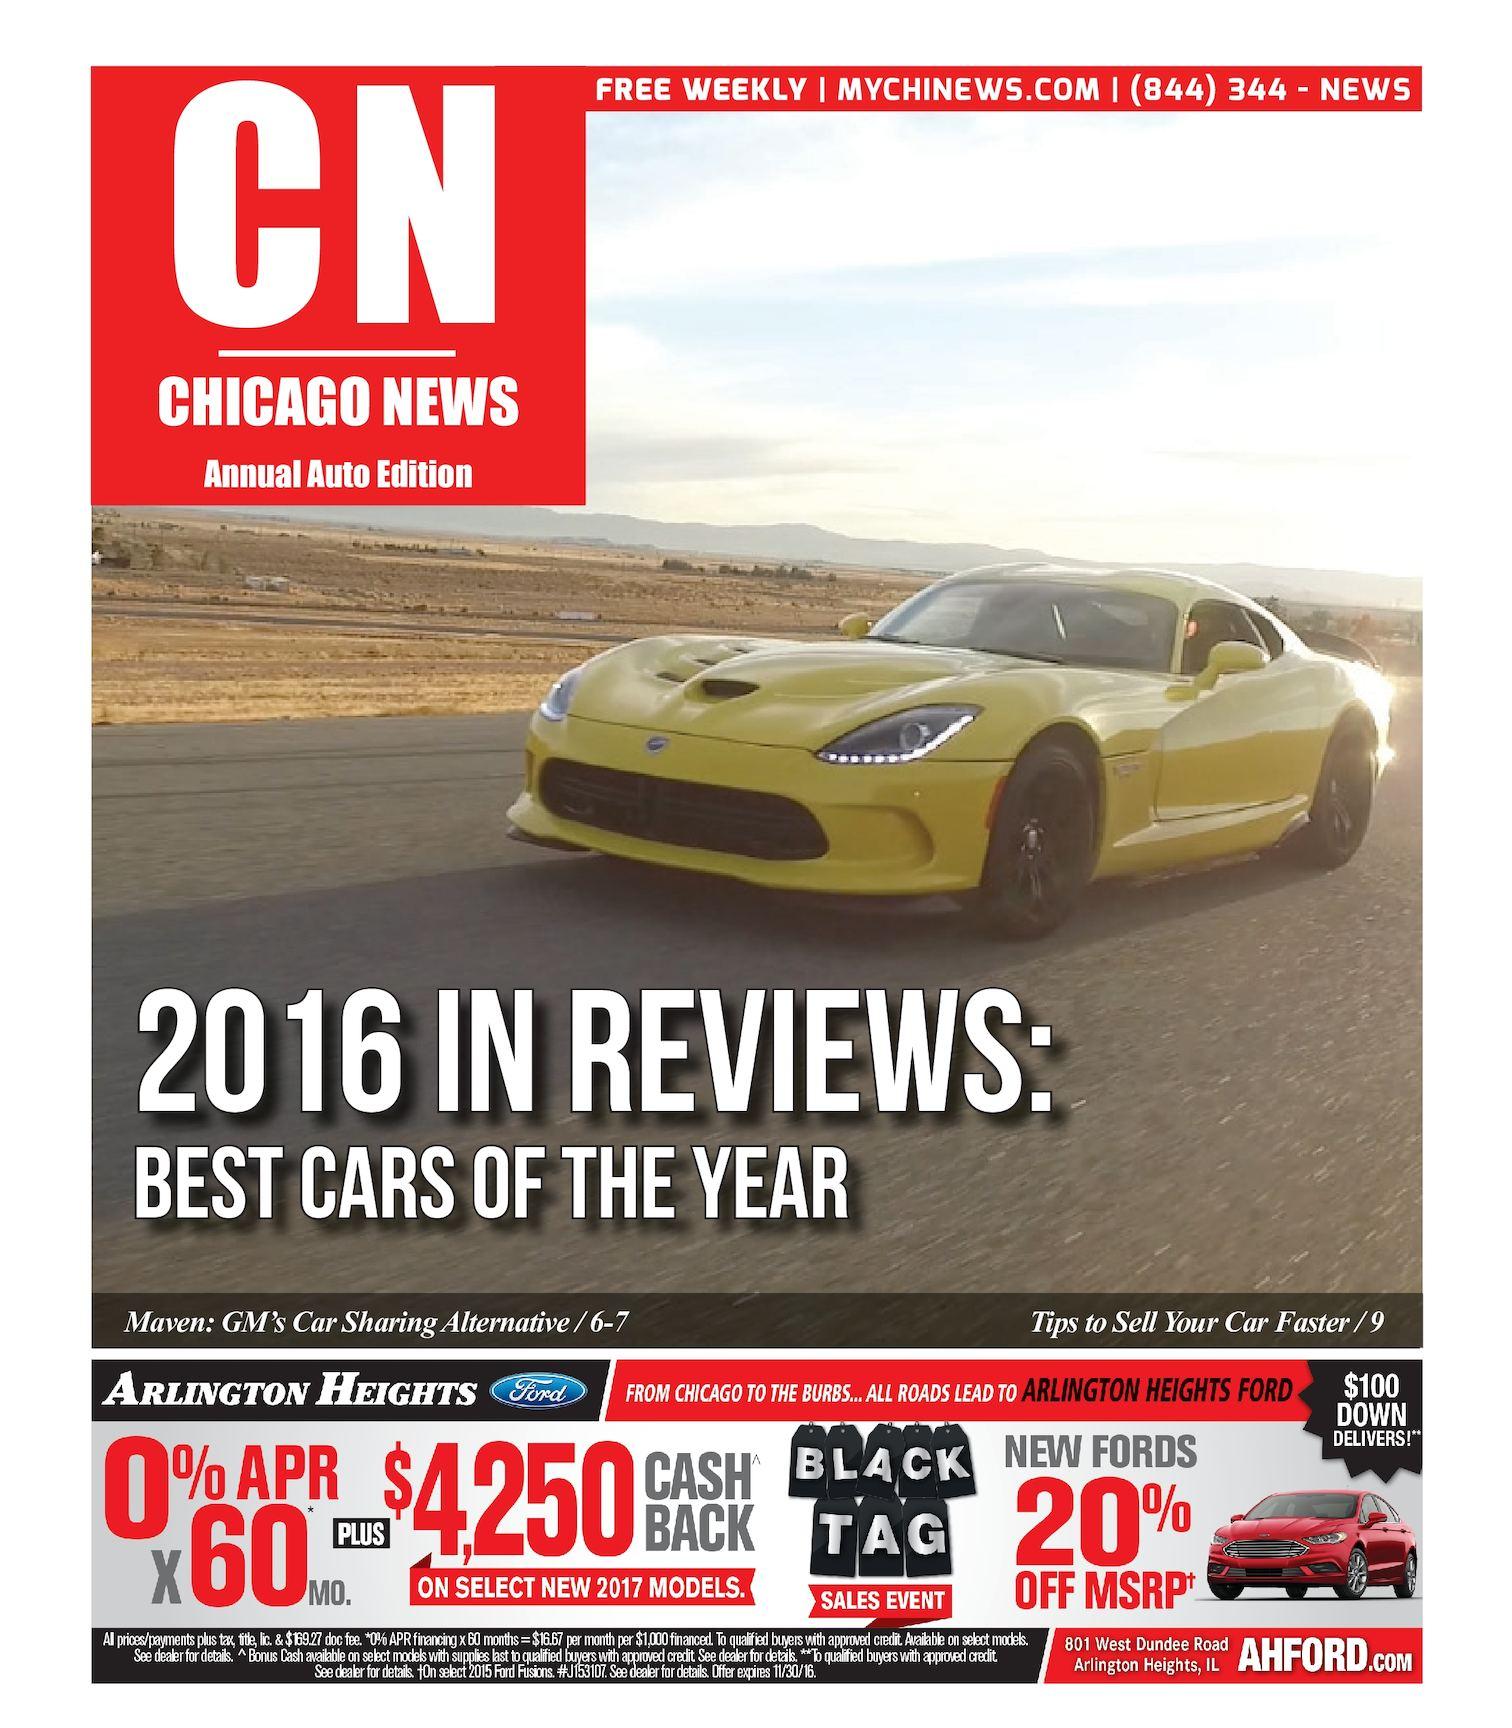 Calaméo - Chicago News | Annual Auto Edition